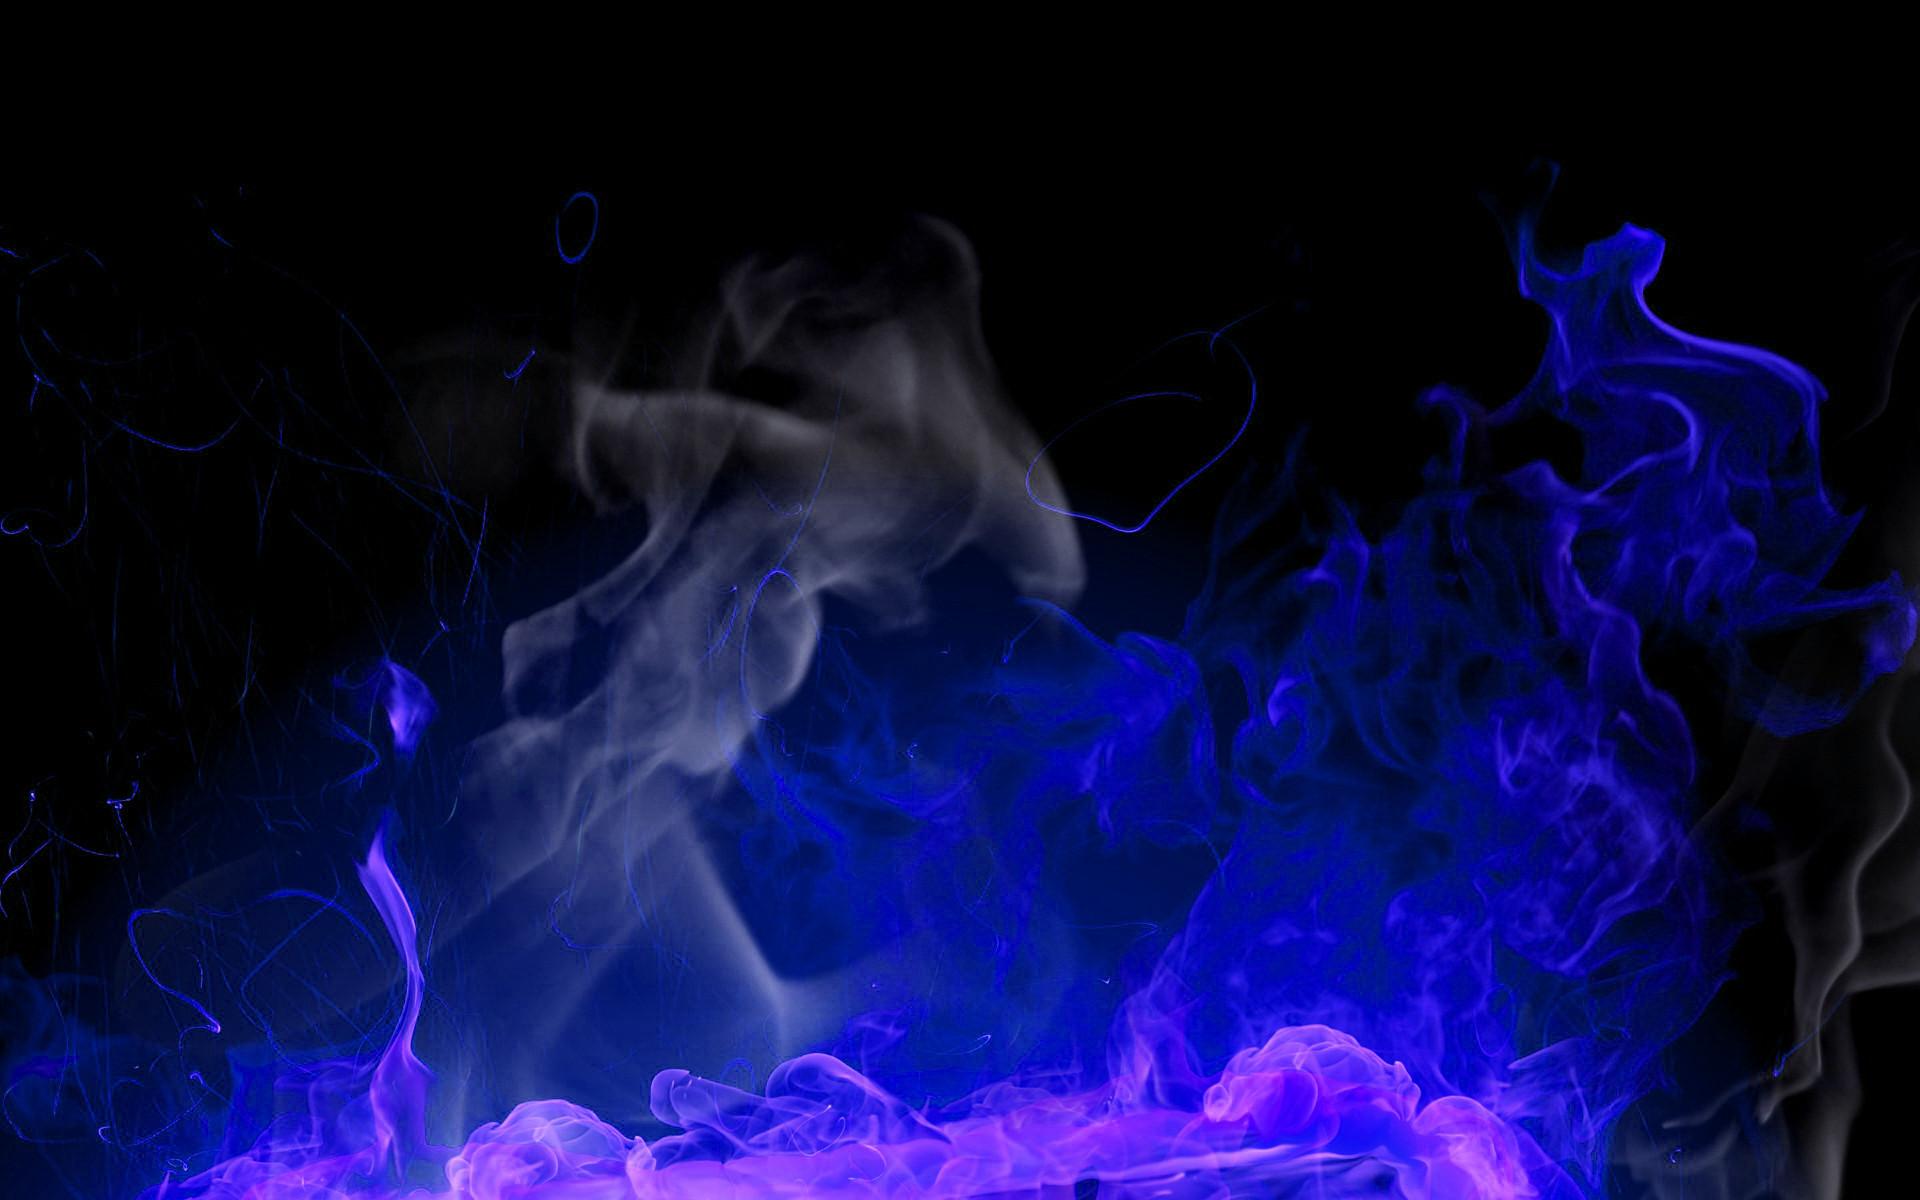 blue smoke wallpaper posted – photo #11